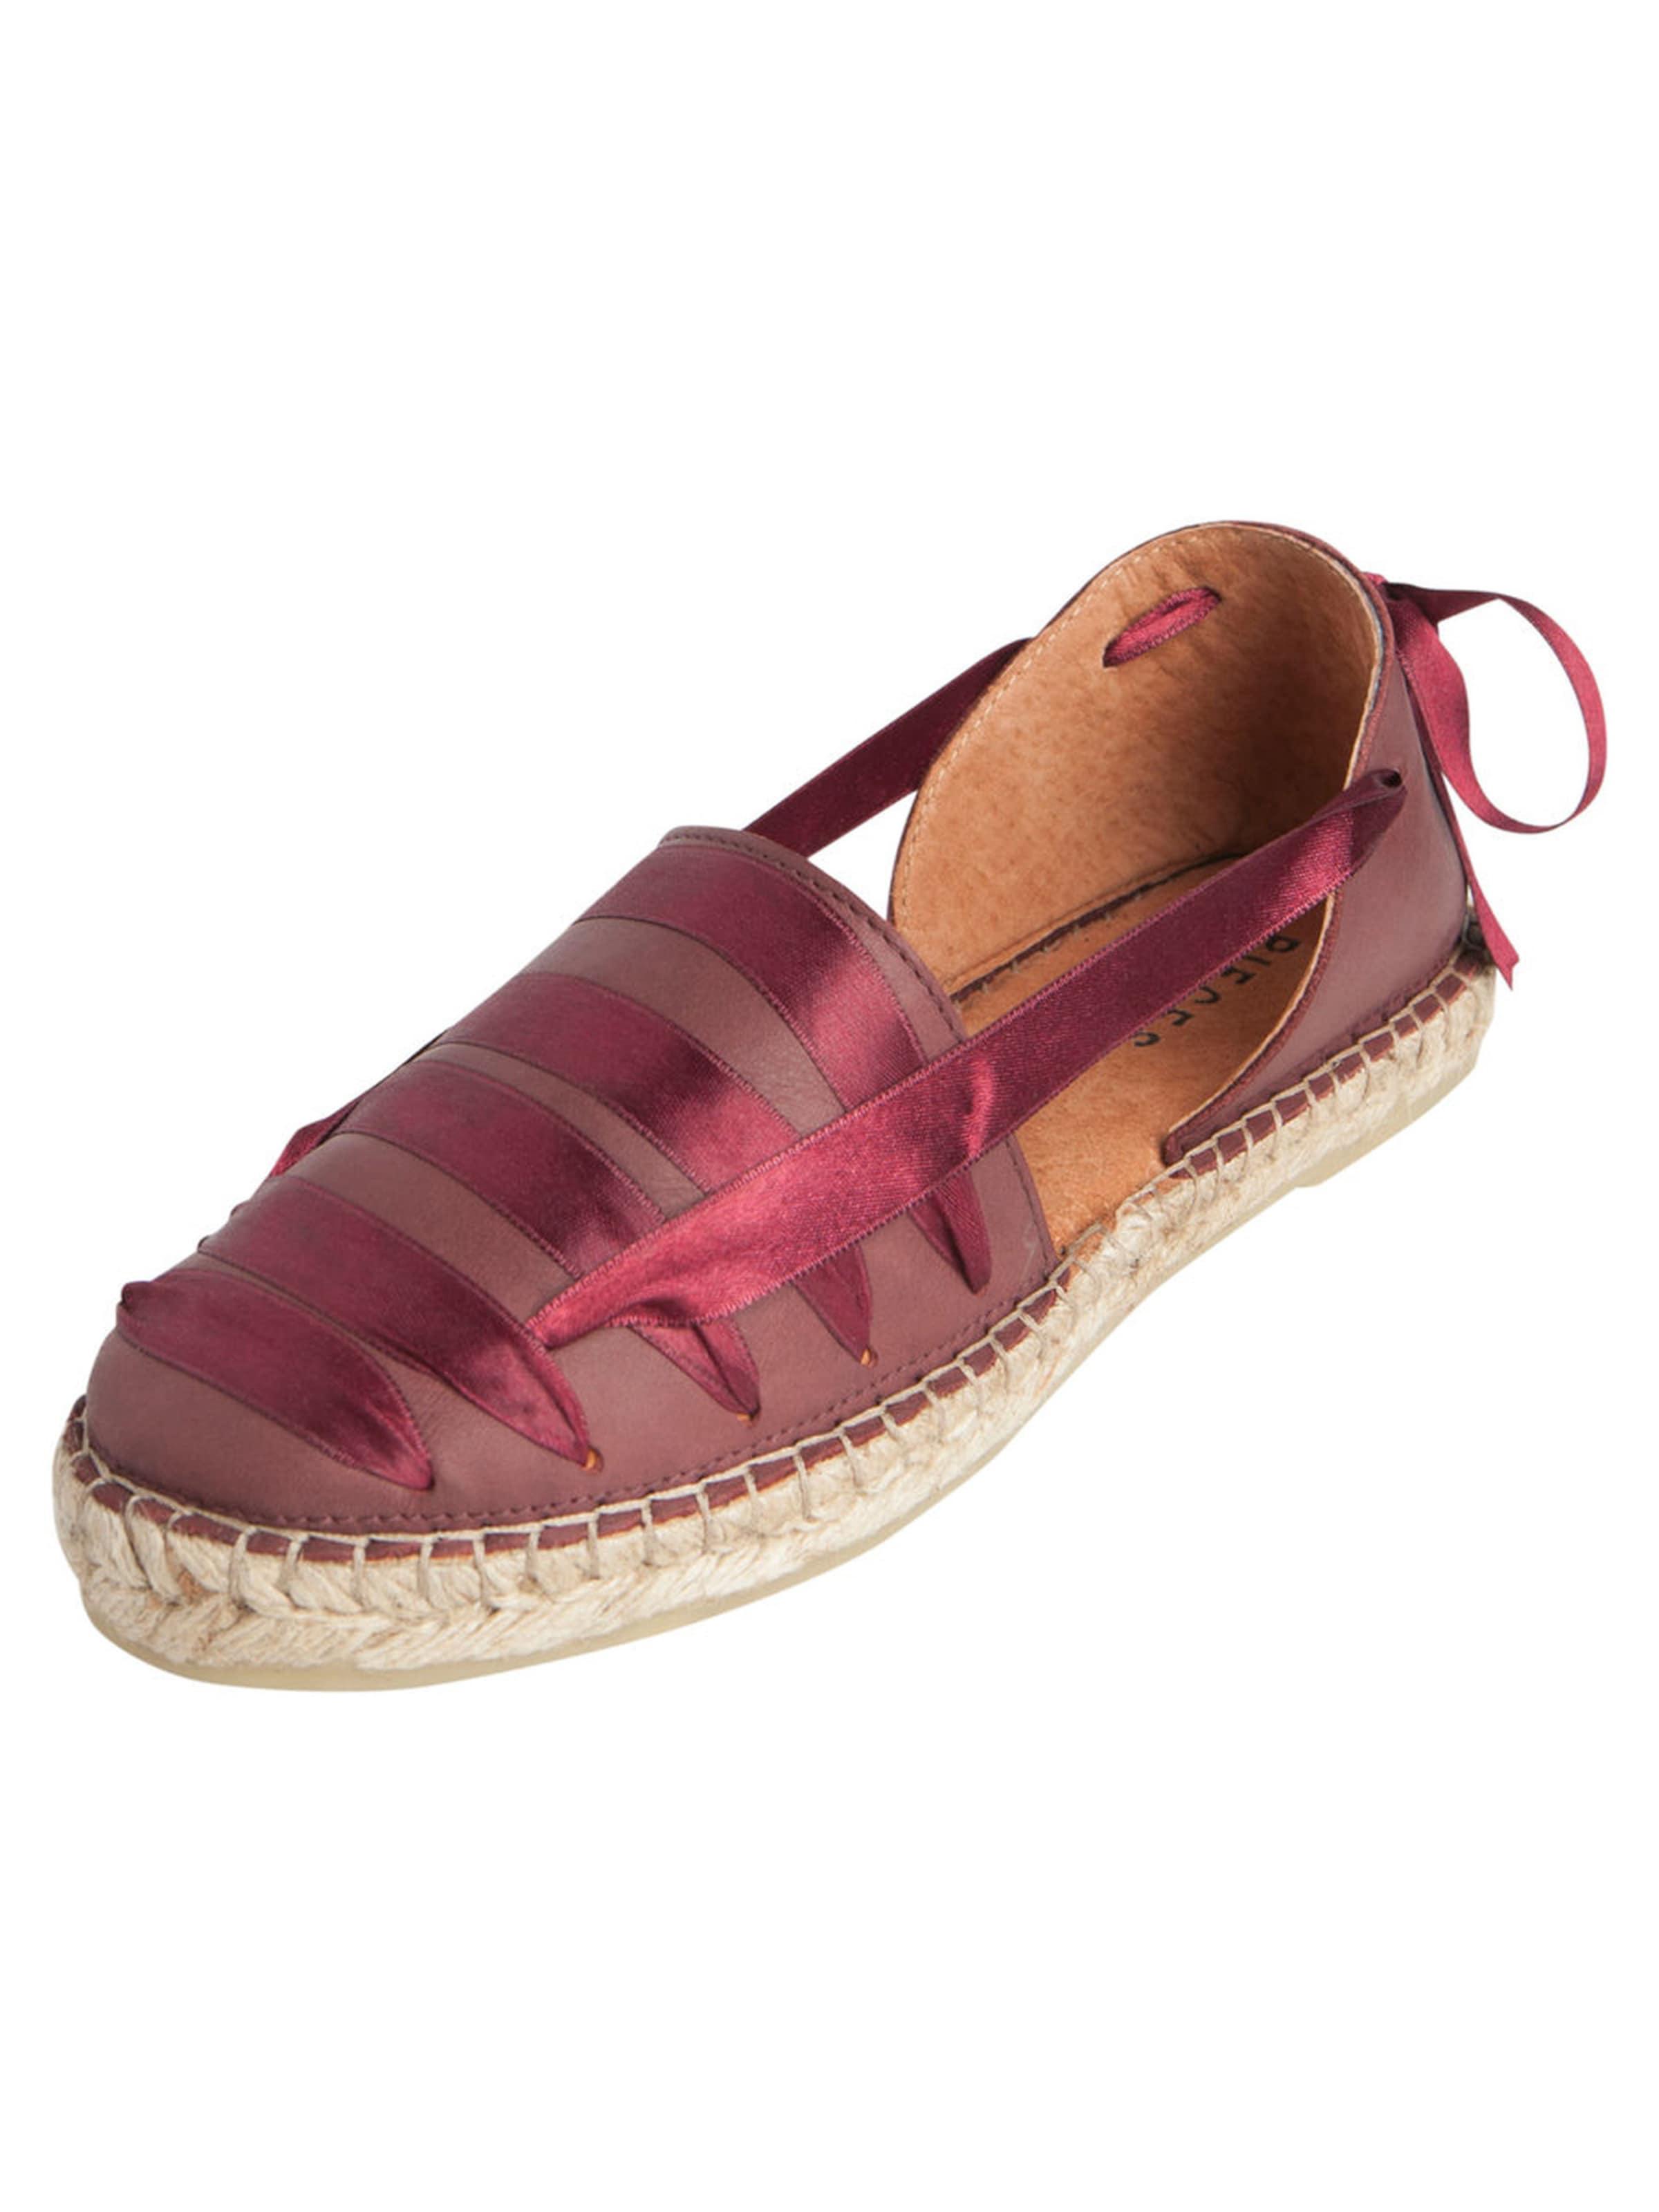 Haltbare Mode billige Schuhe PIECES | Espadrilles Schuhe Gut getragene Schuhe